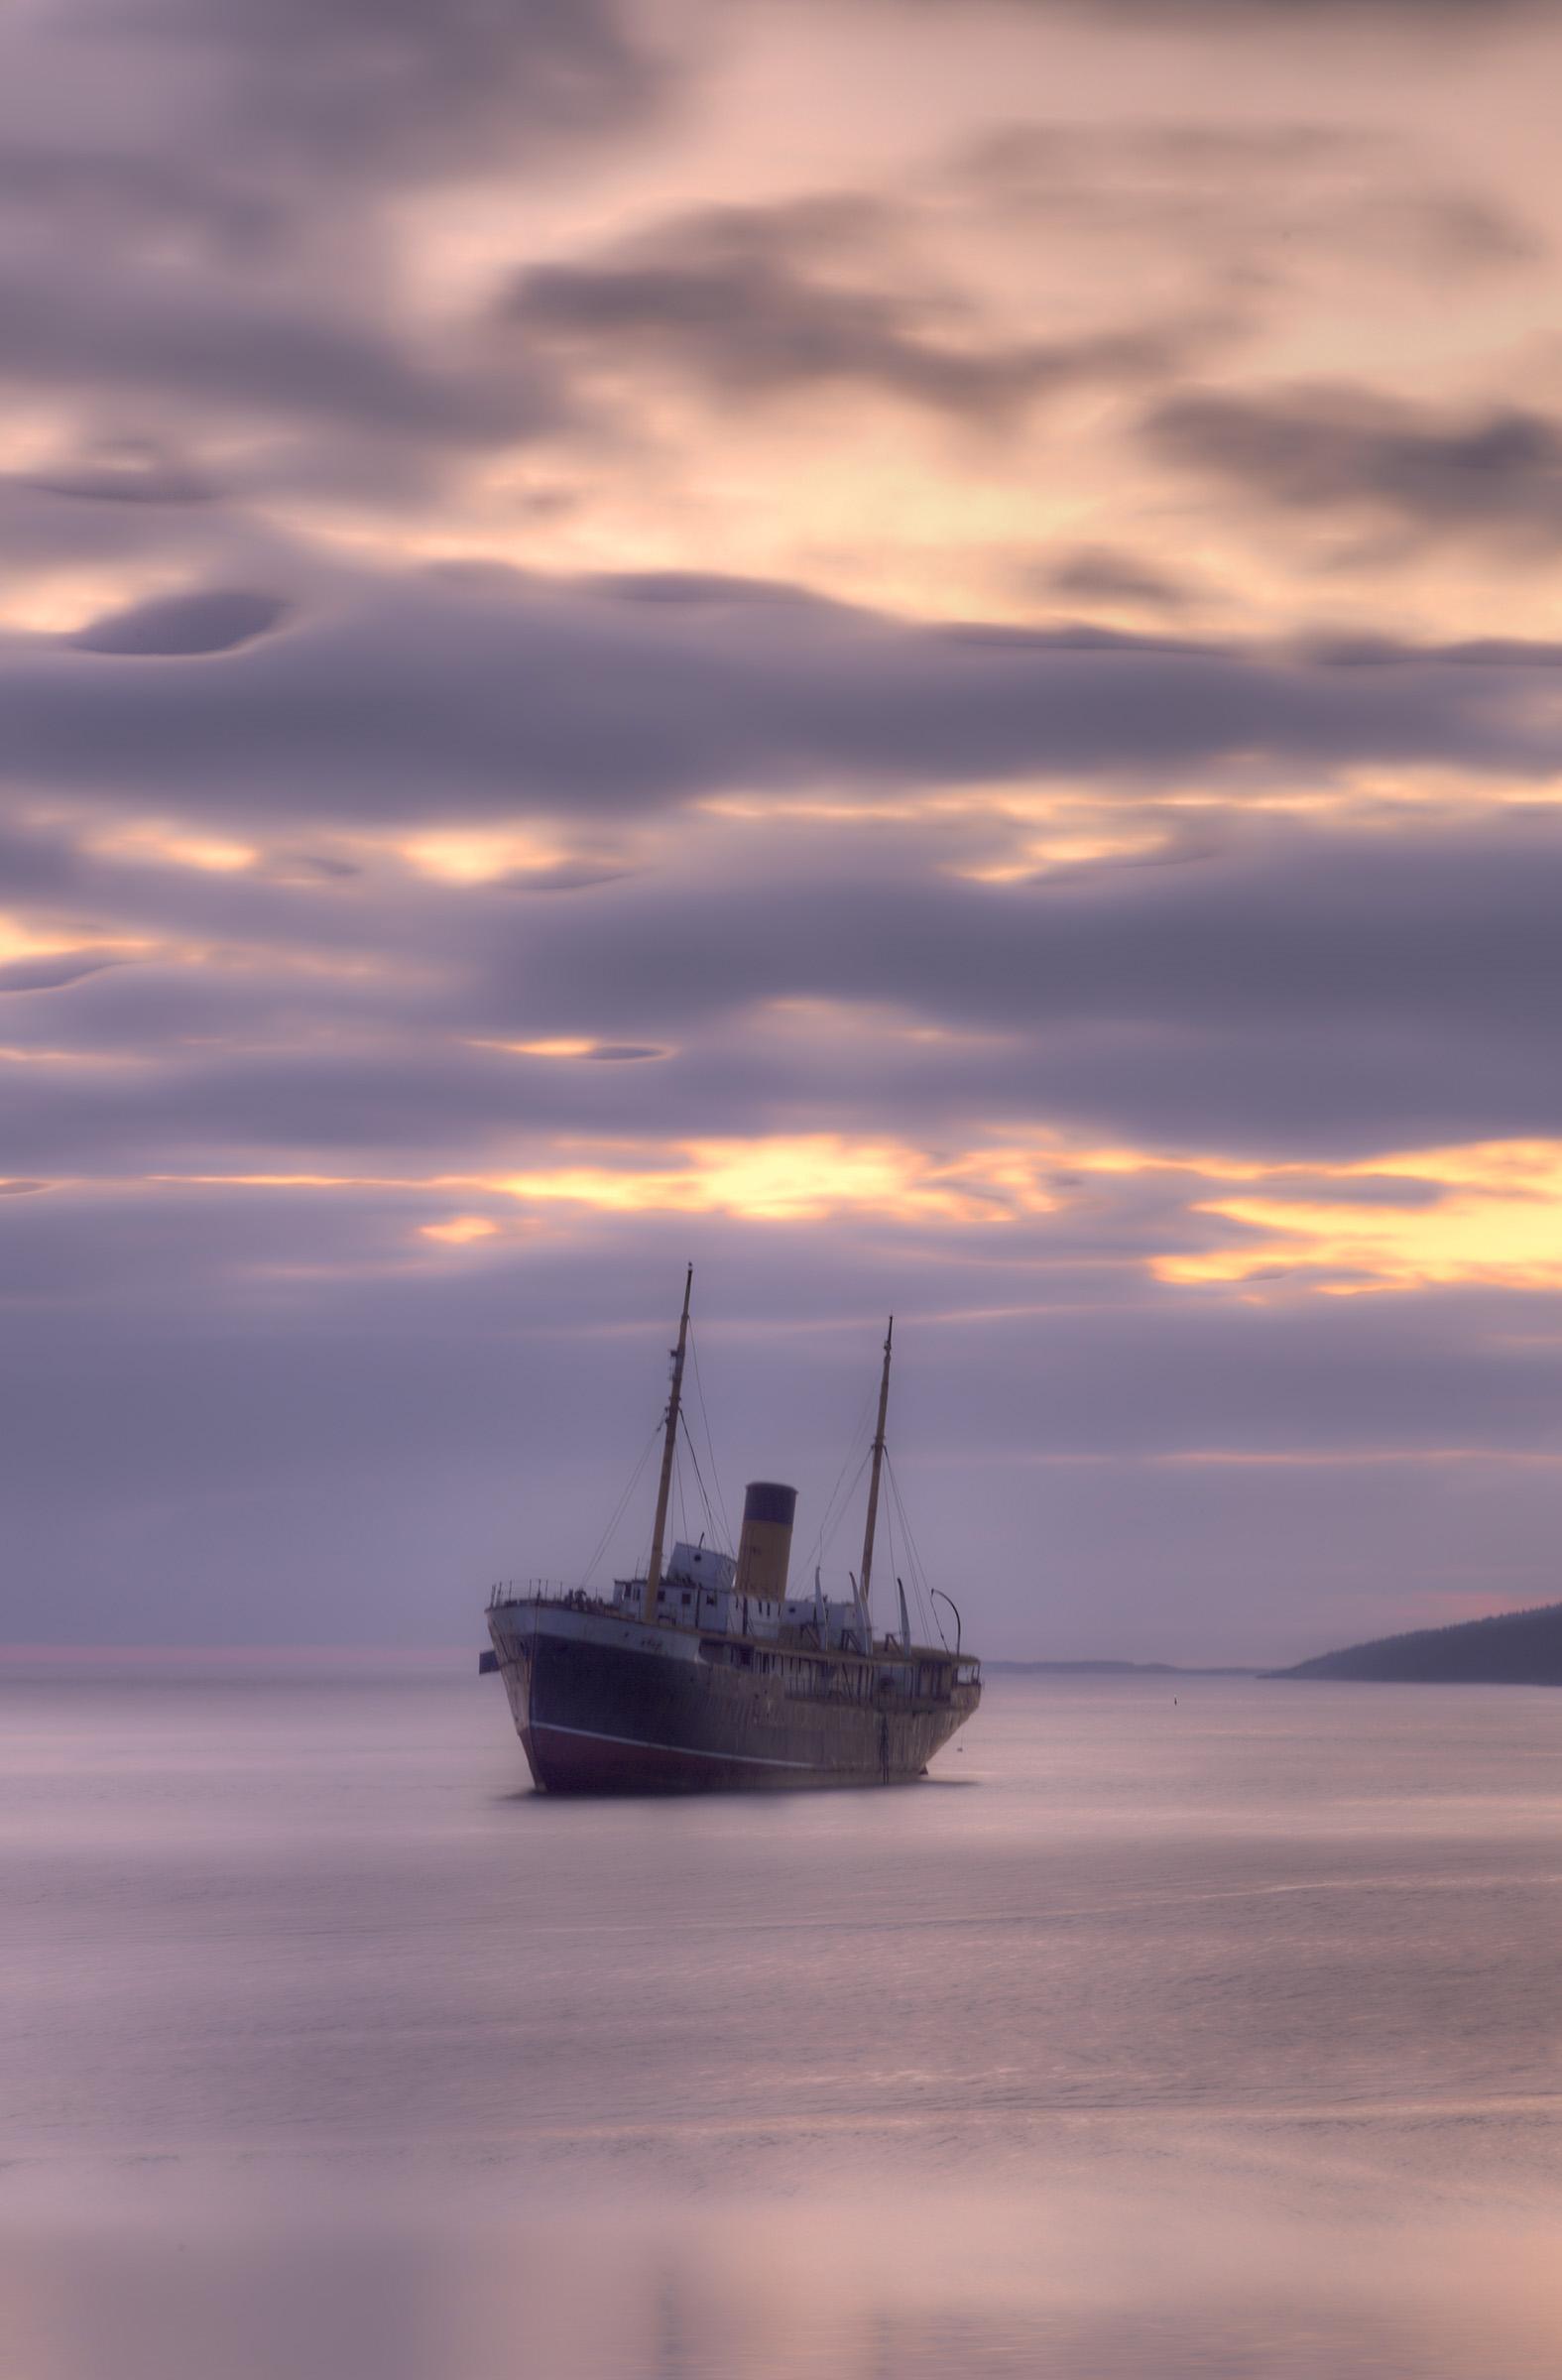 Shipwreck, Black, Summertime, Sink, Sinking, HQ Photo